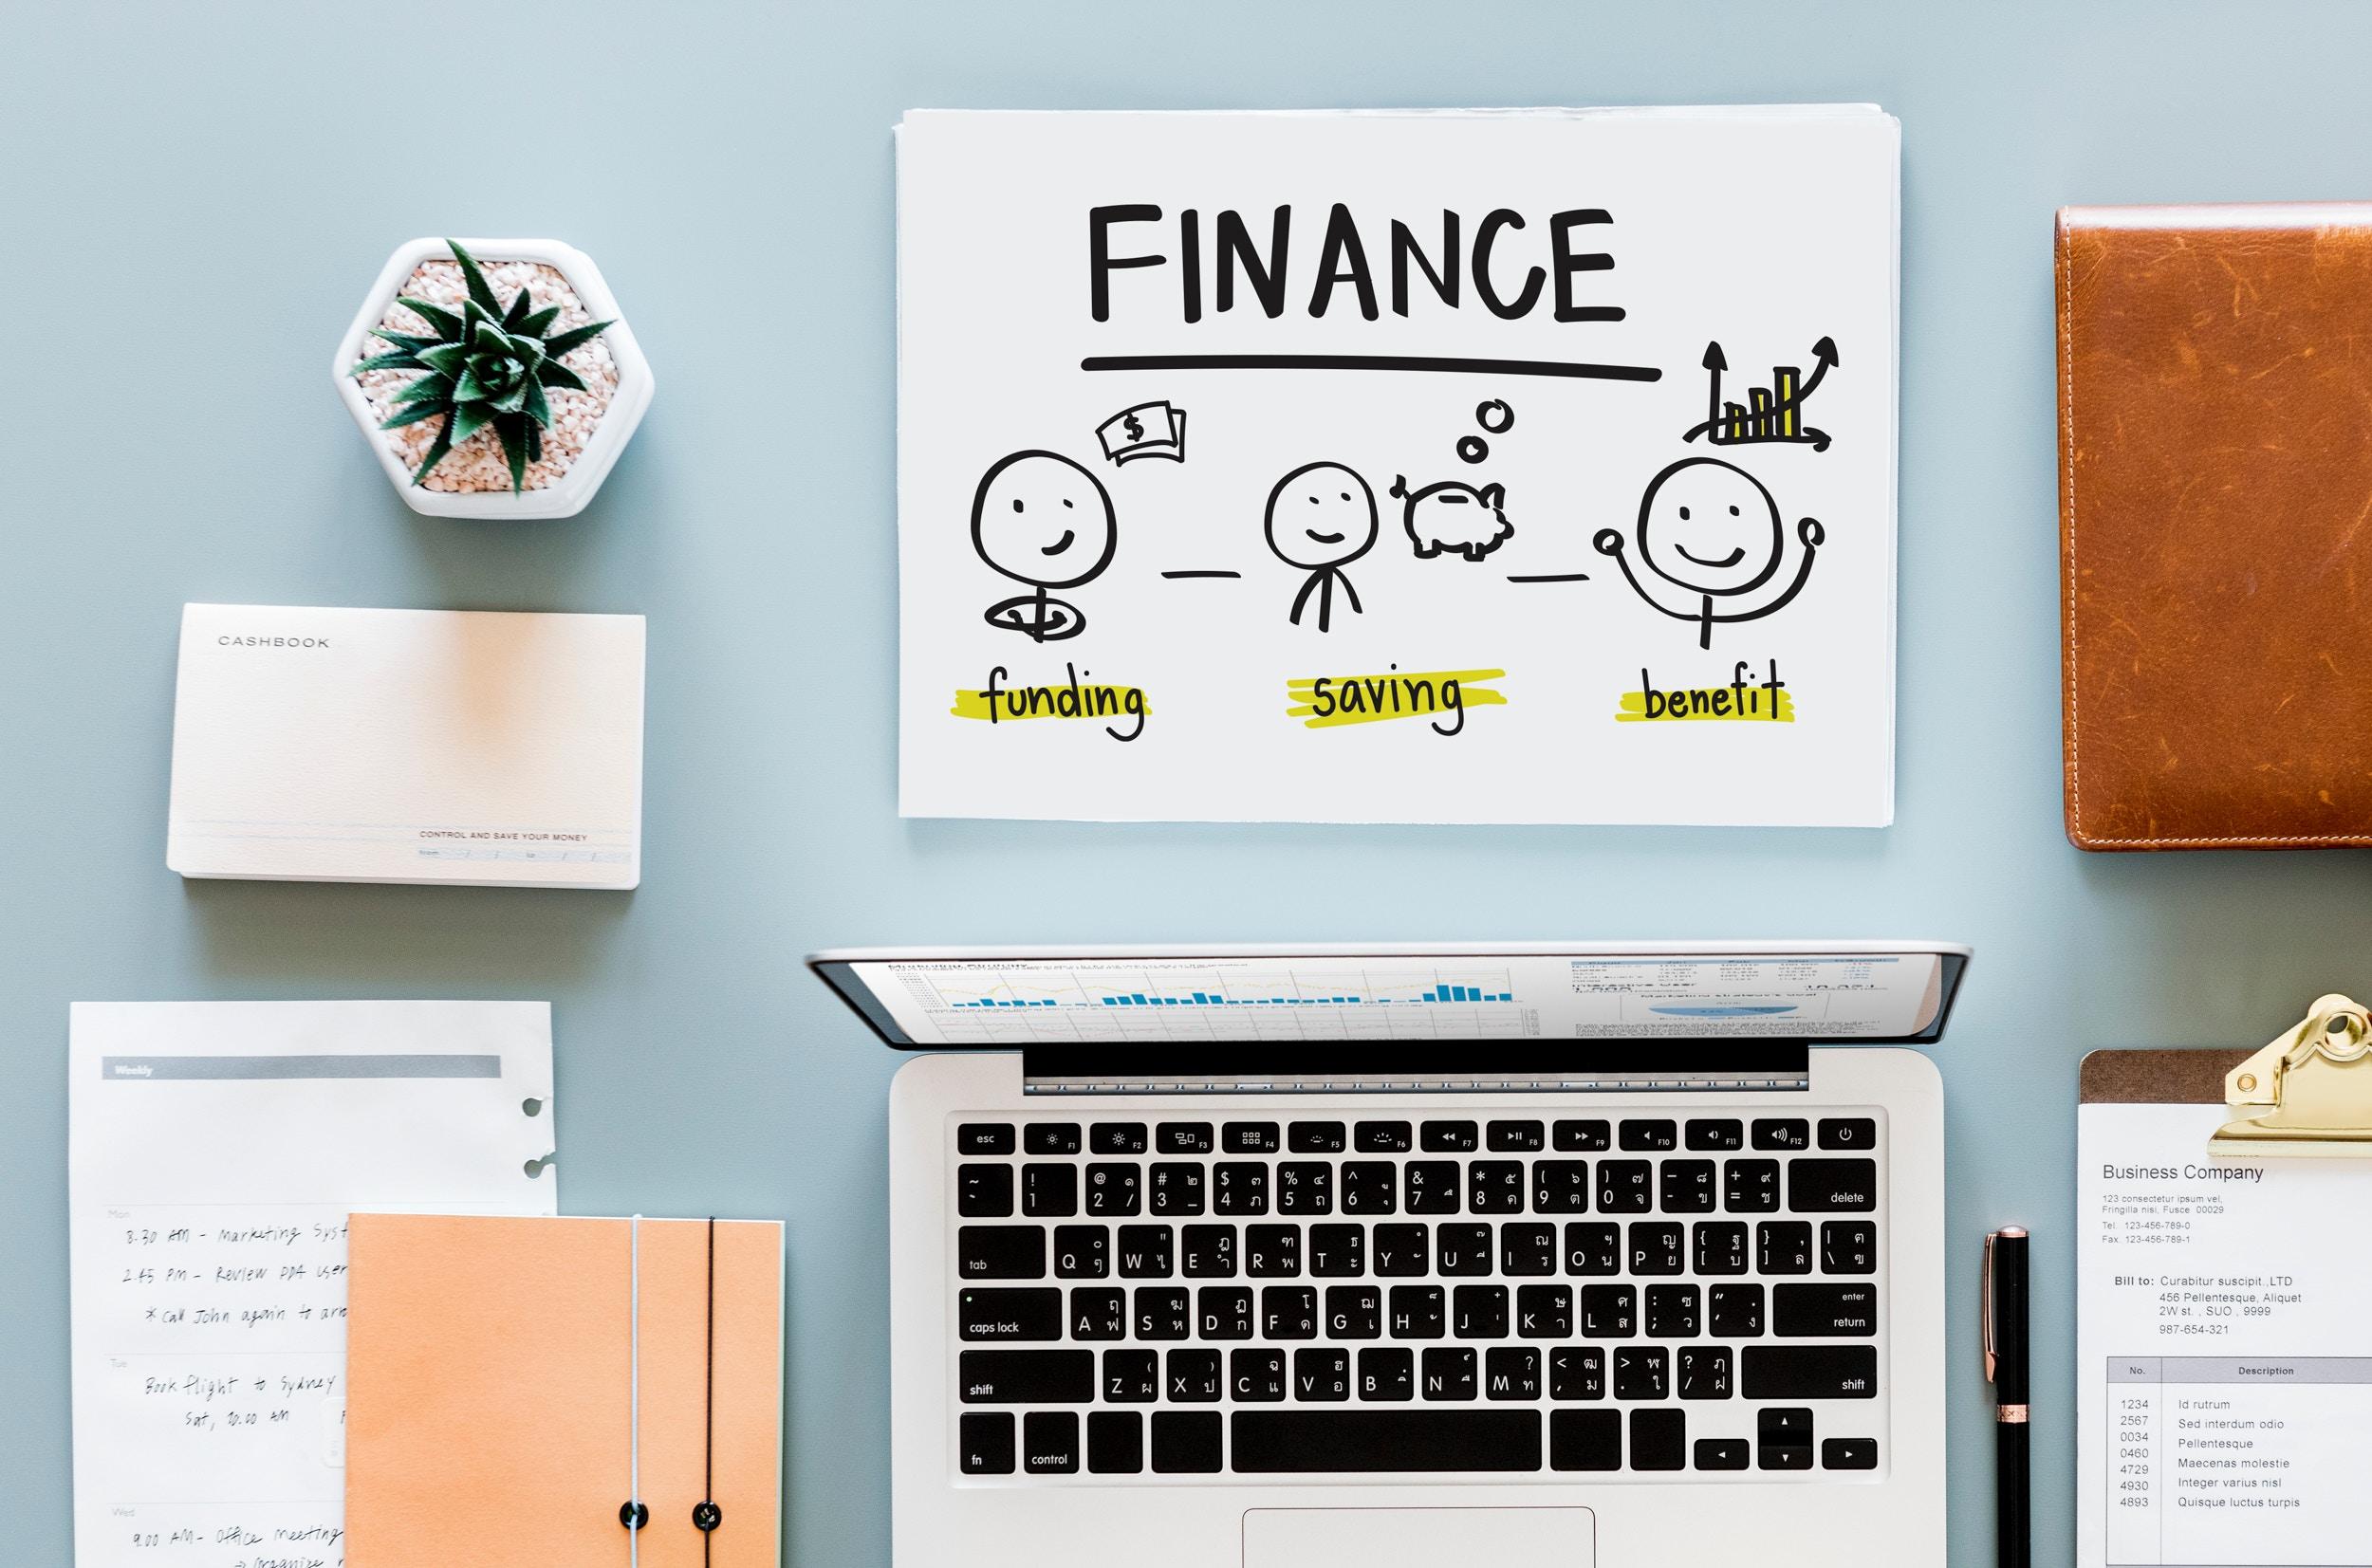 Finance Image.jpg